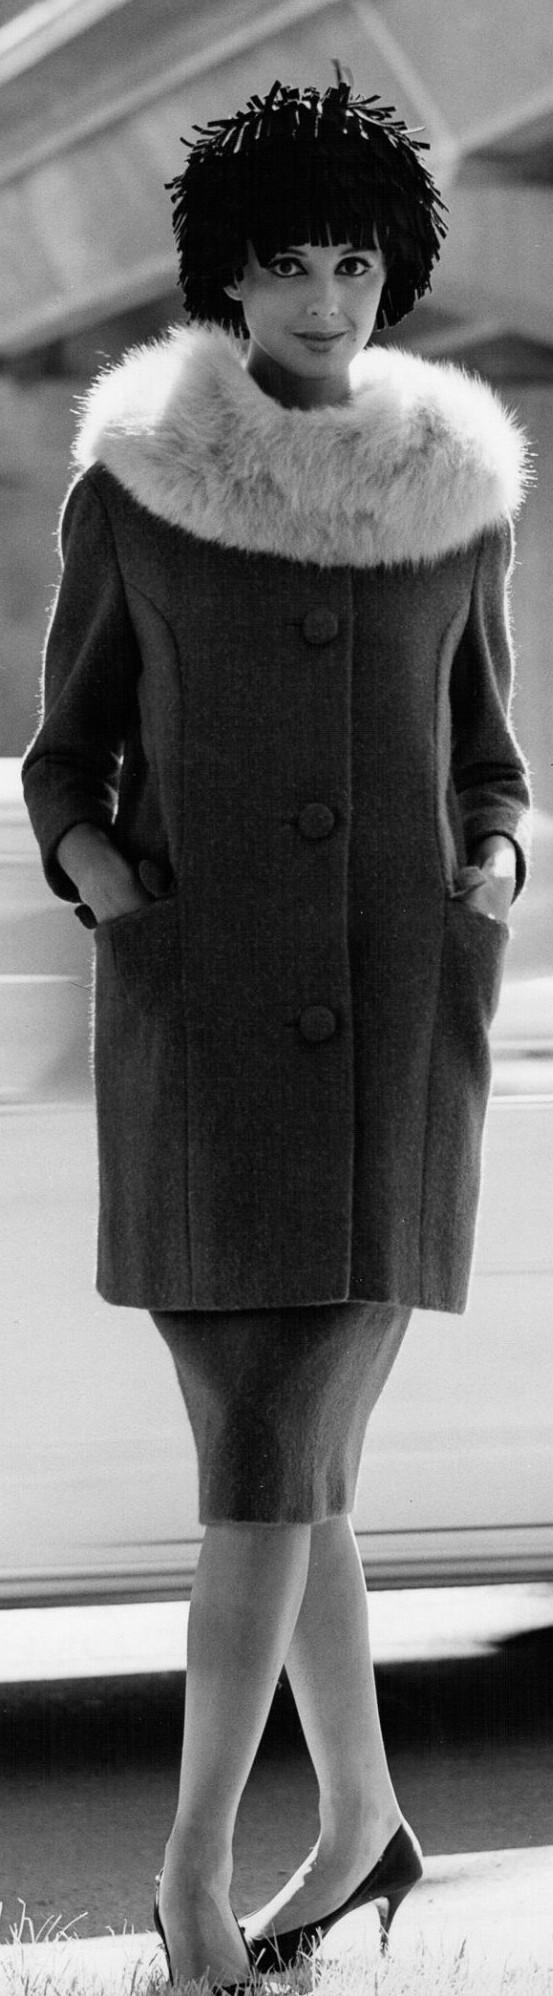 Sarli couture 1958-59